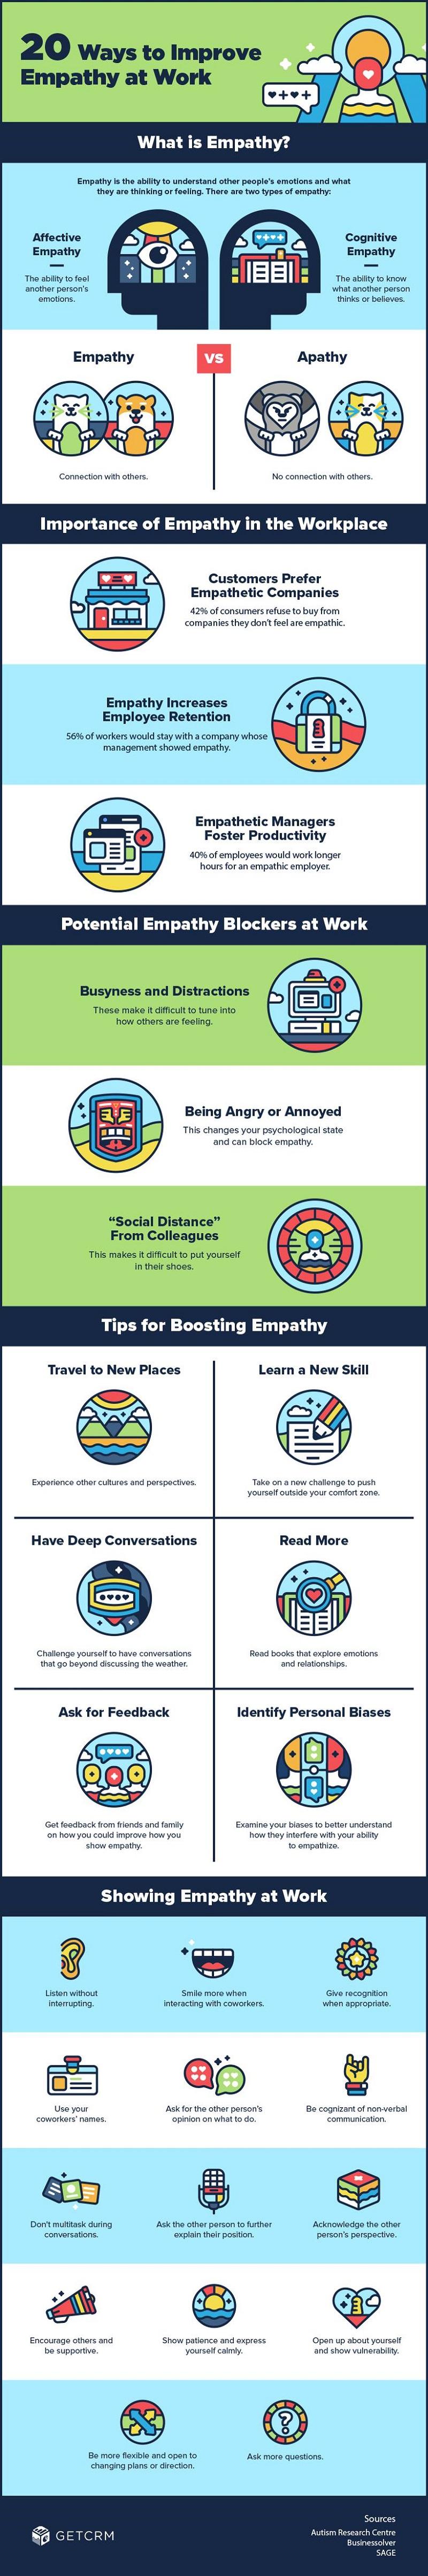 20 Ways to Improve Empathy at Work